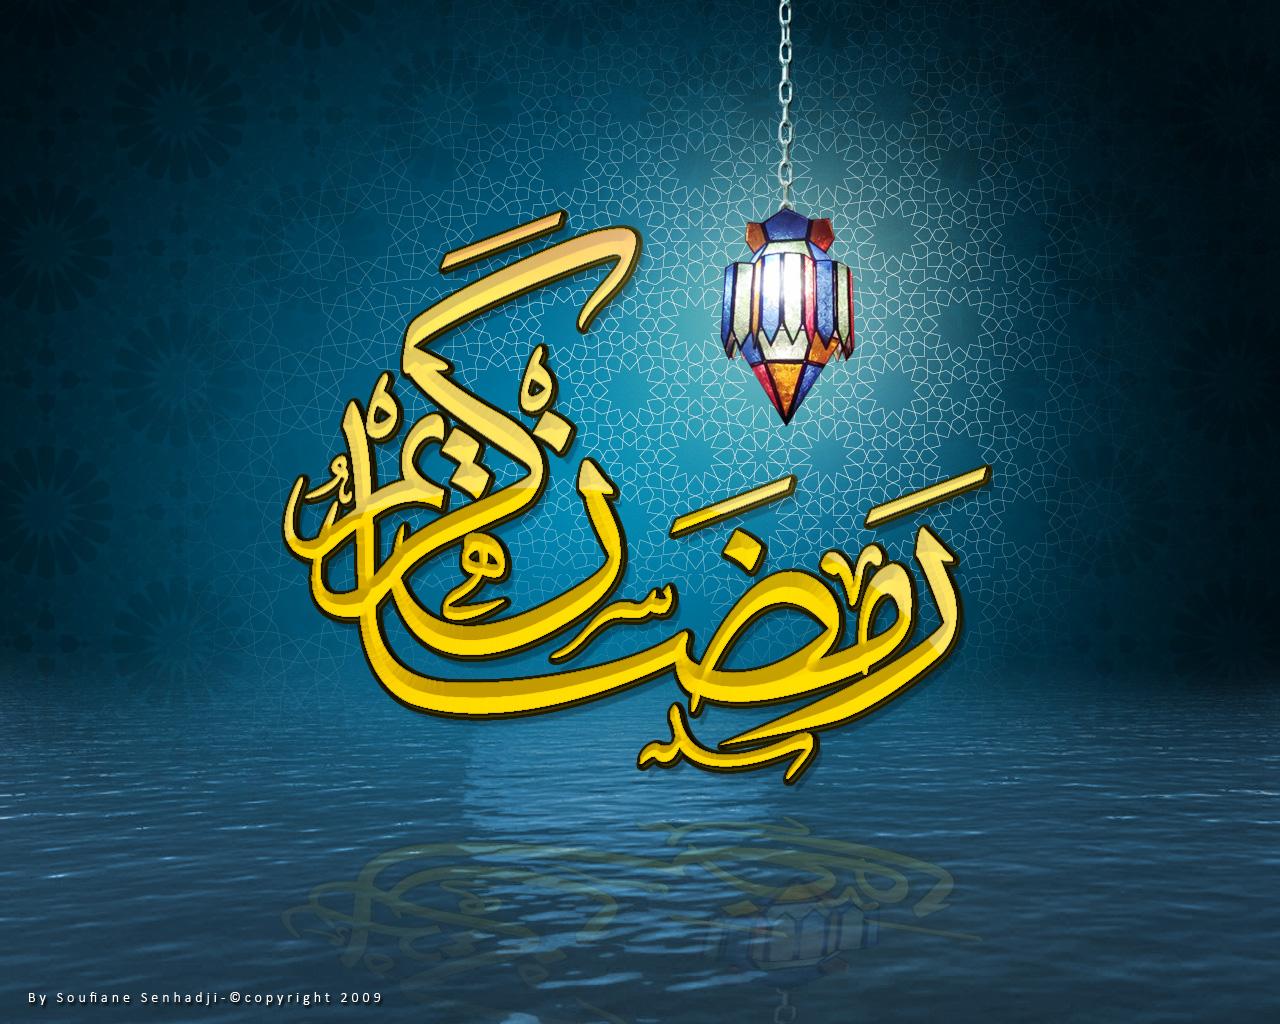 صور رمضان 2020 أجمل صور فوانيس رمضان 2021 بطاقات تهنئة لرمضان تهنئة رمضان بالأسماء 8